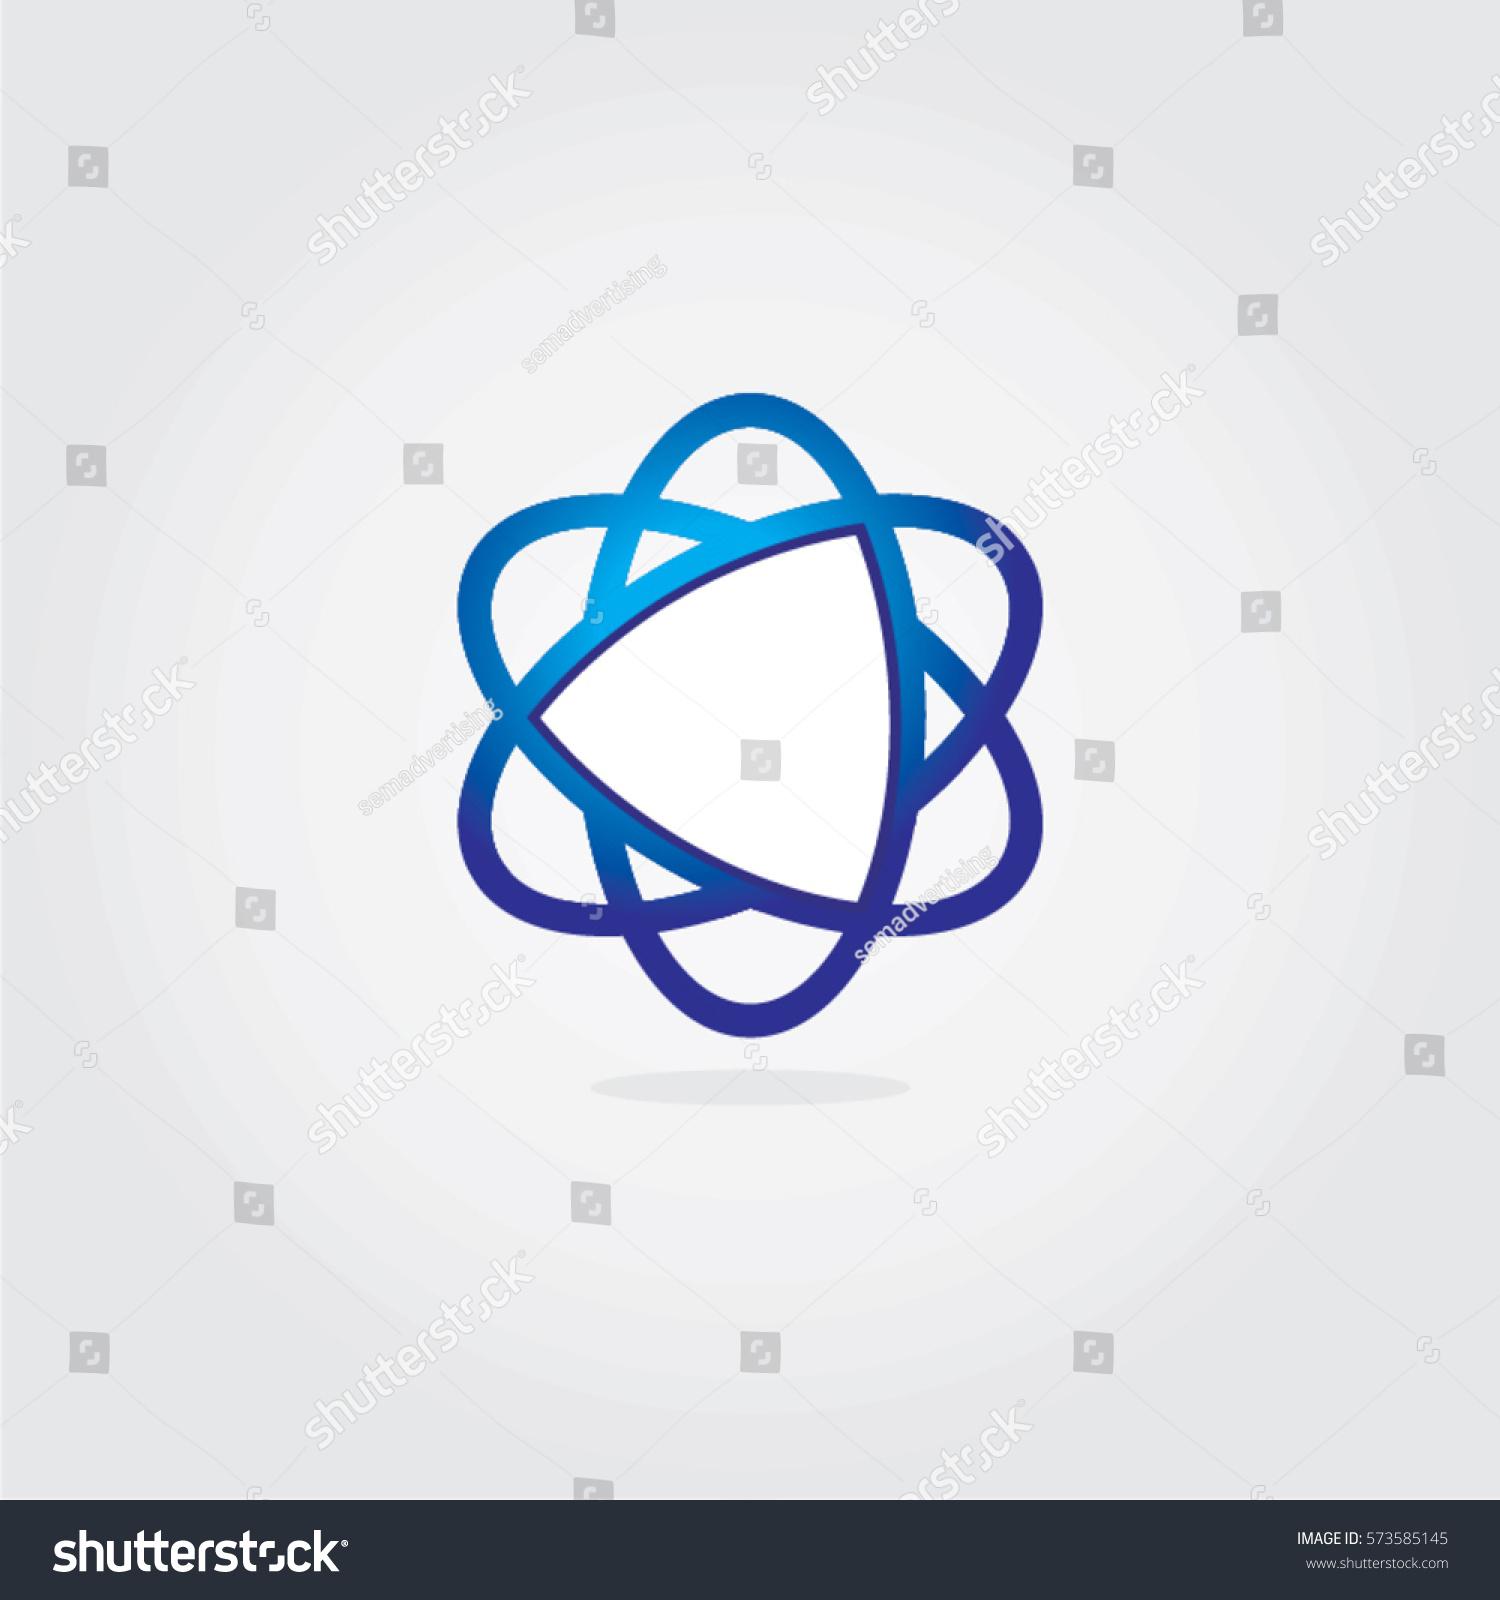 random oval shape logo overlapping circle stock vector